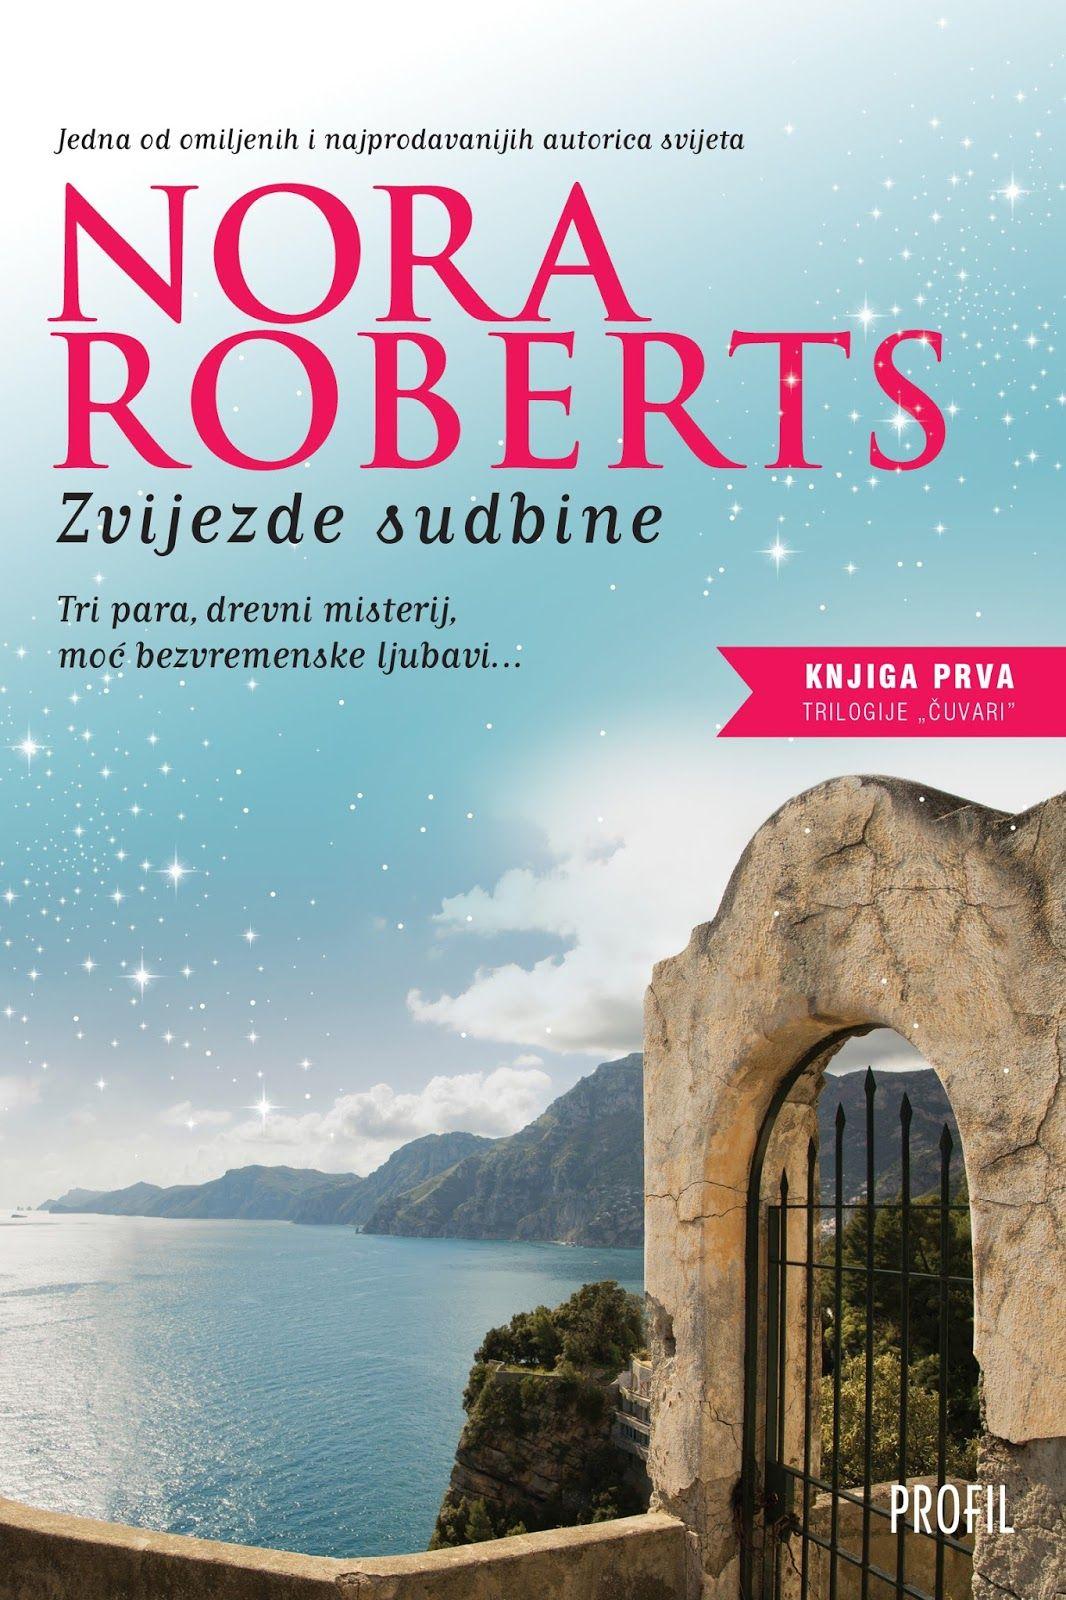 Pdf books image by Sladja Nikolic on Books Download